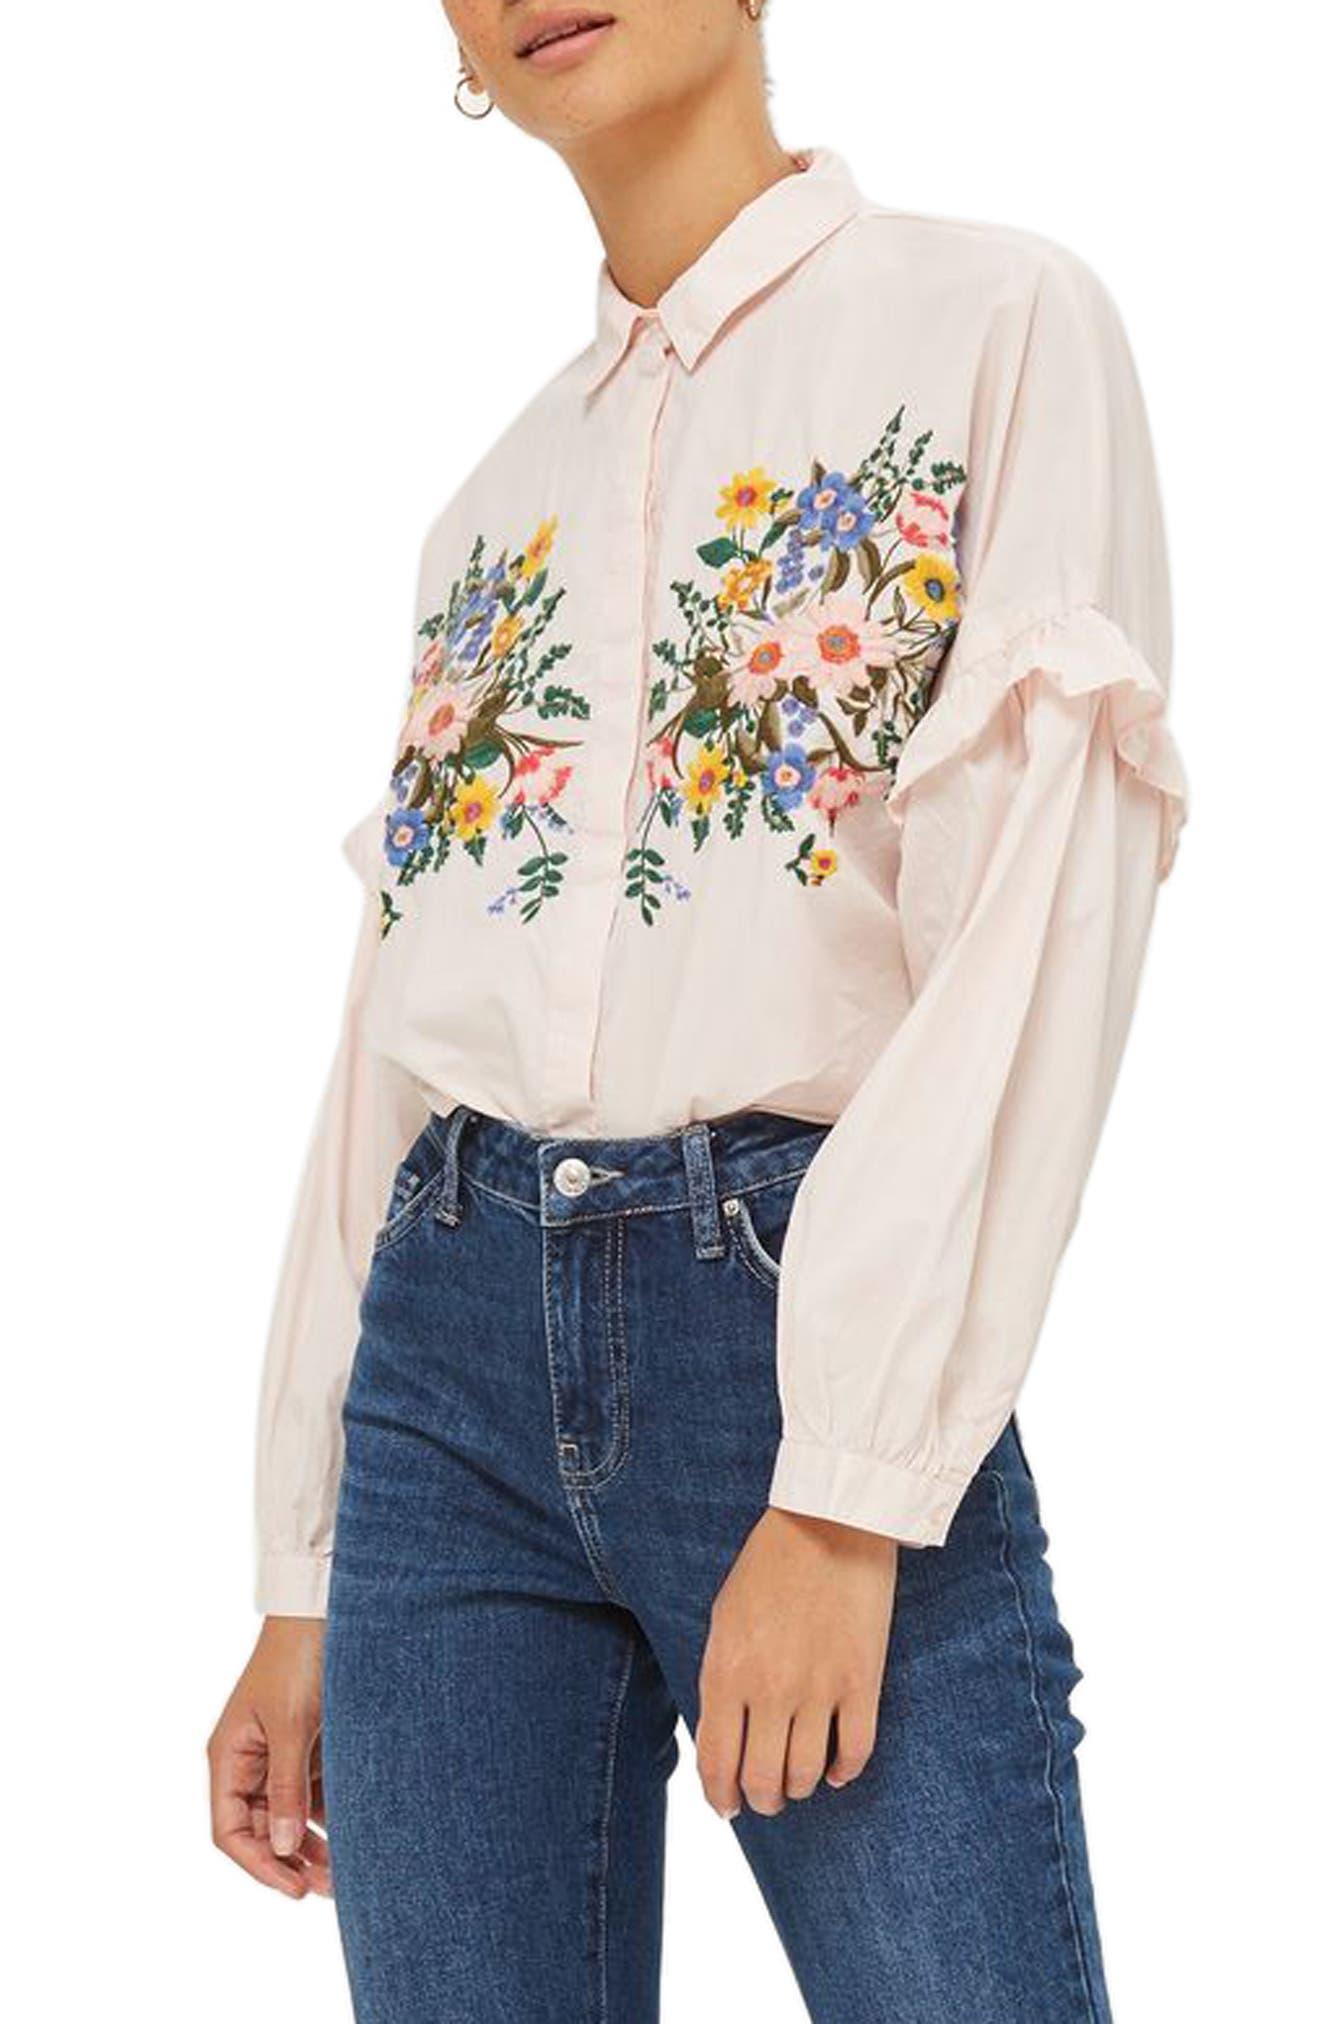 Alternate Image 1 Selected - Topshop Forest Floral Embroidered Shirt